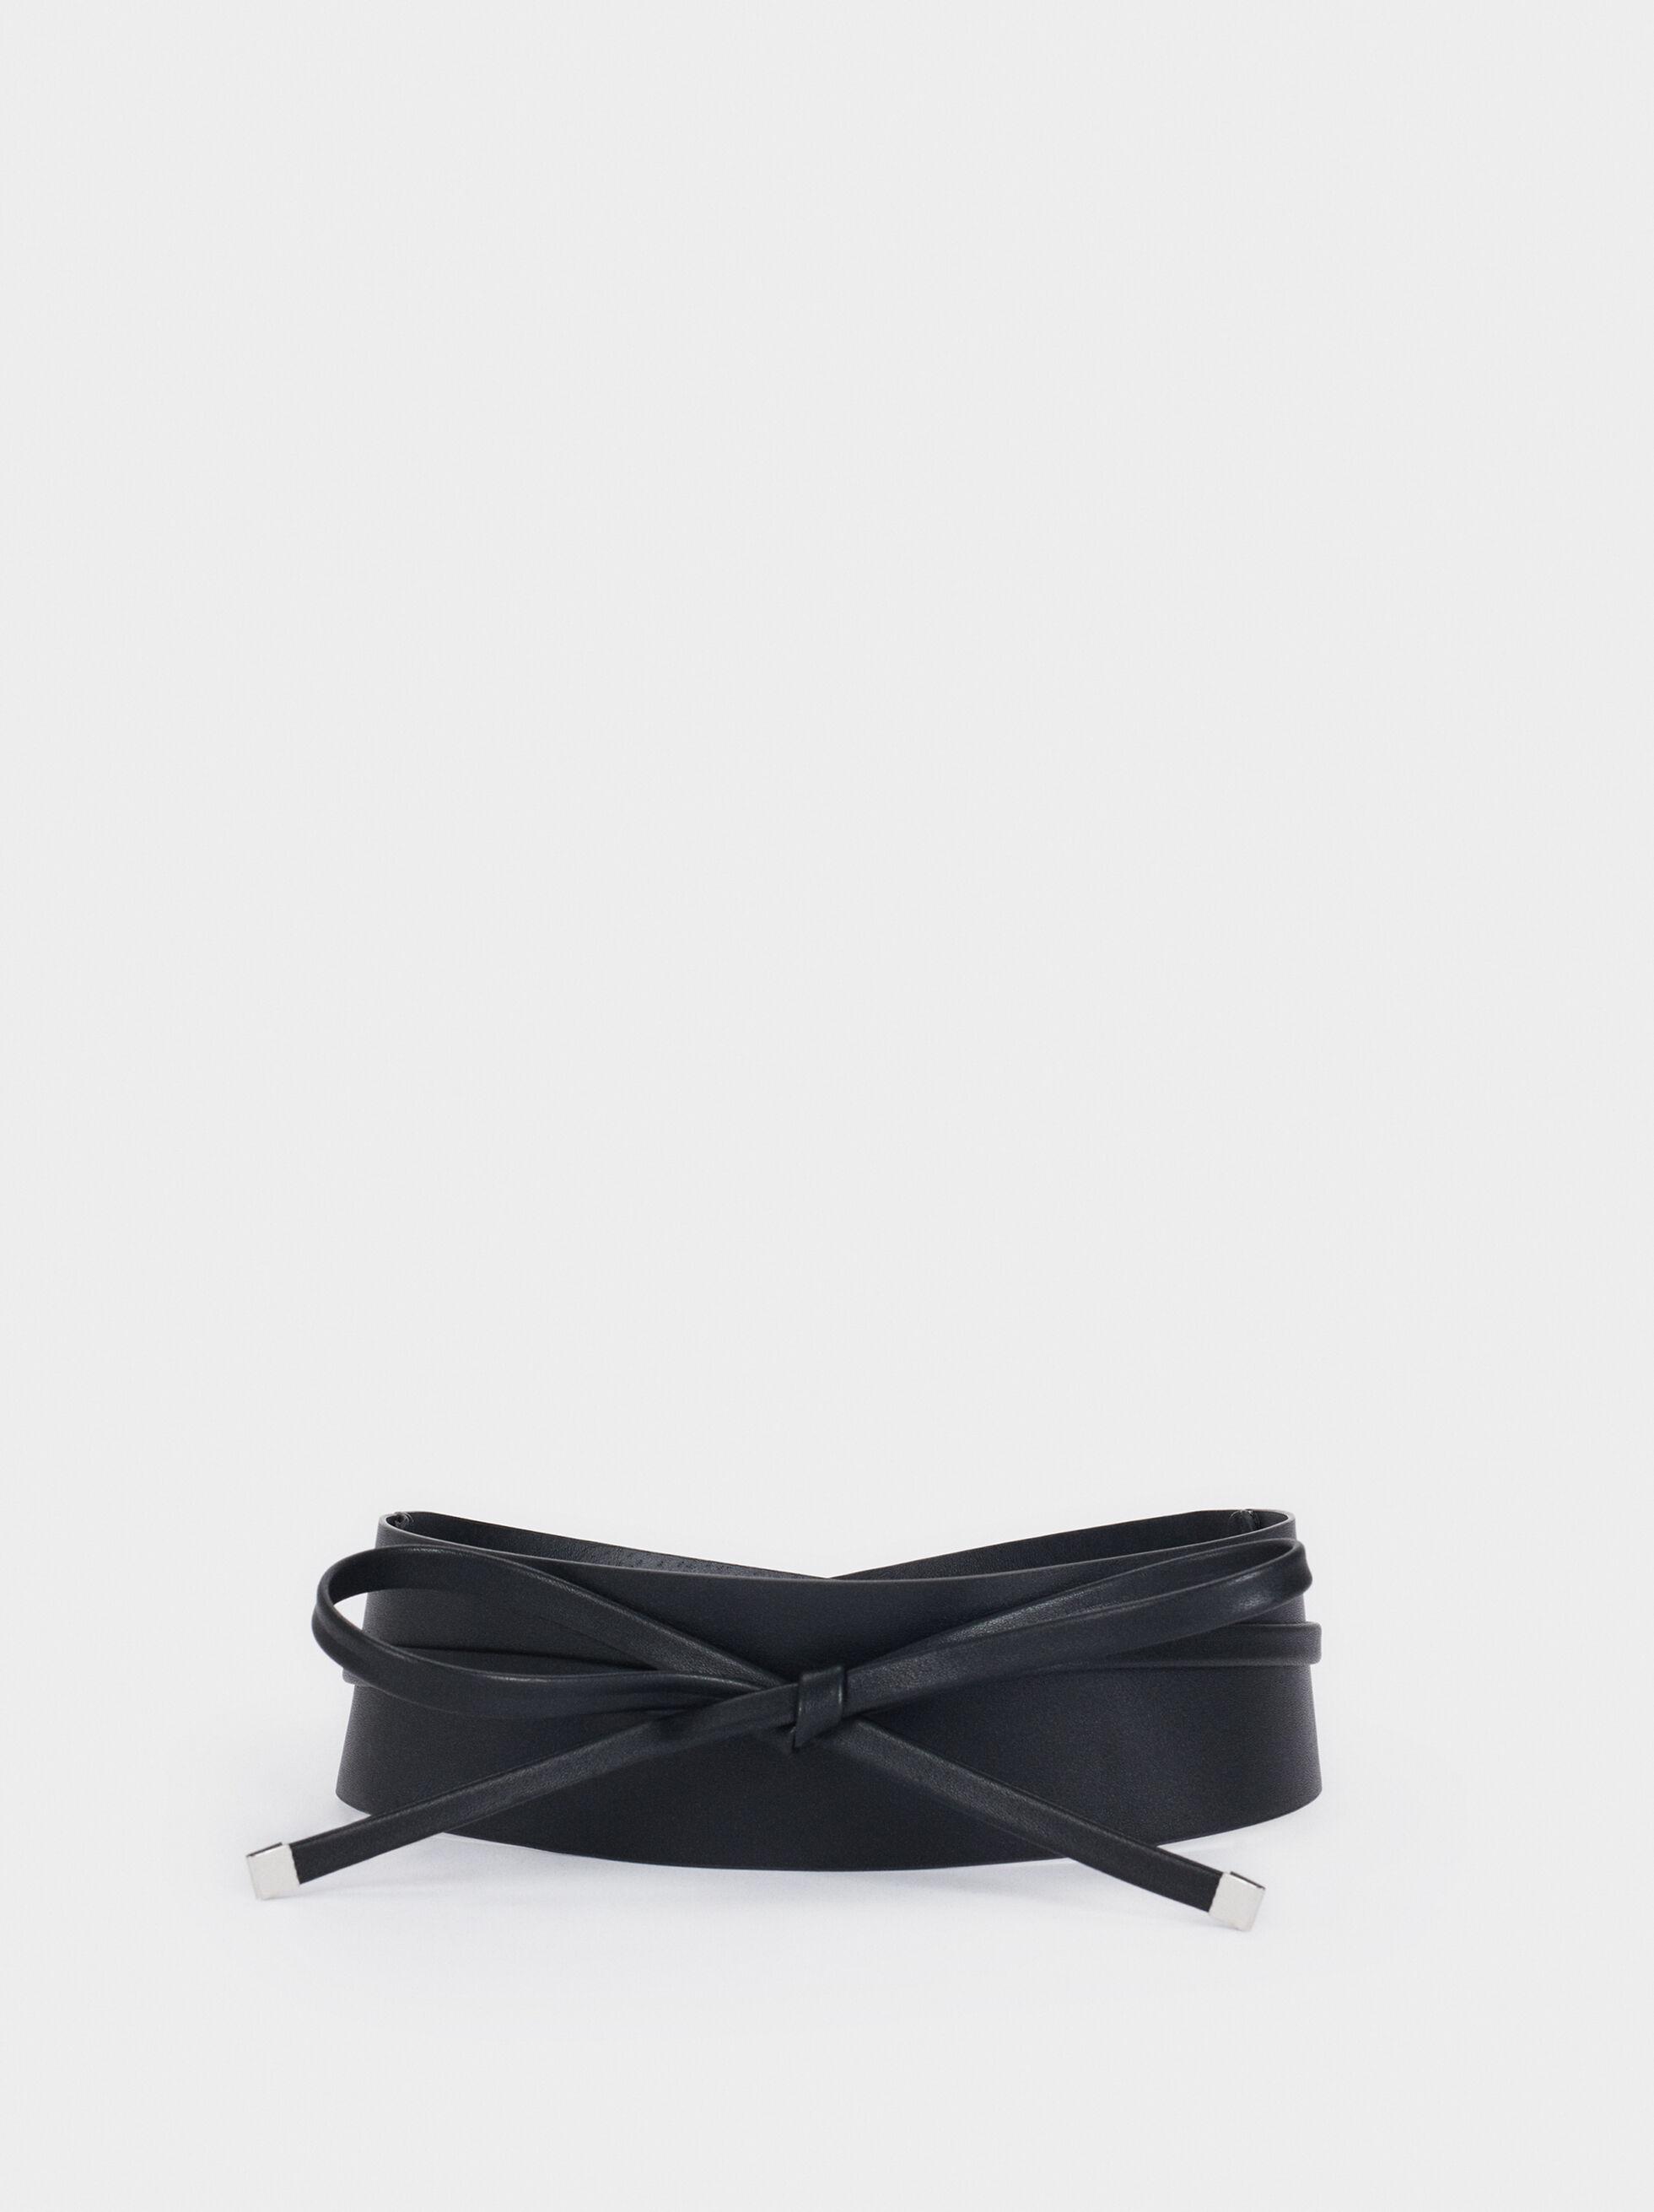 Leather Texture Long Belt, , hi-res